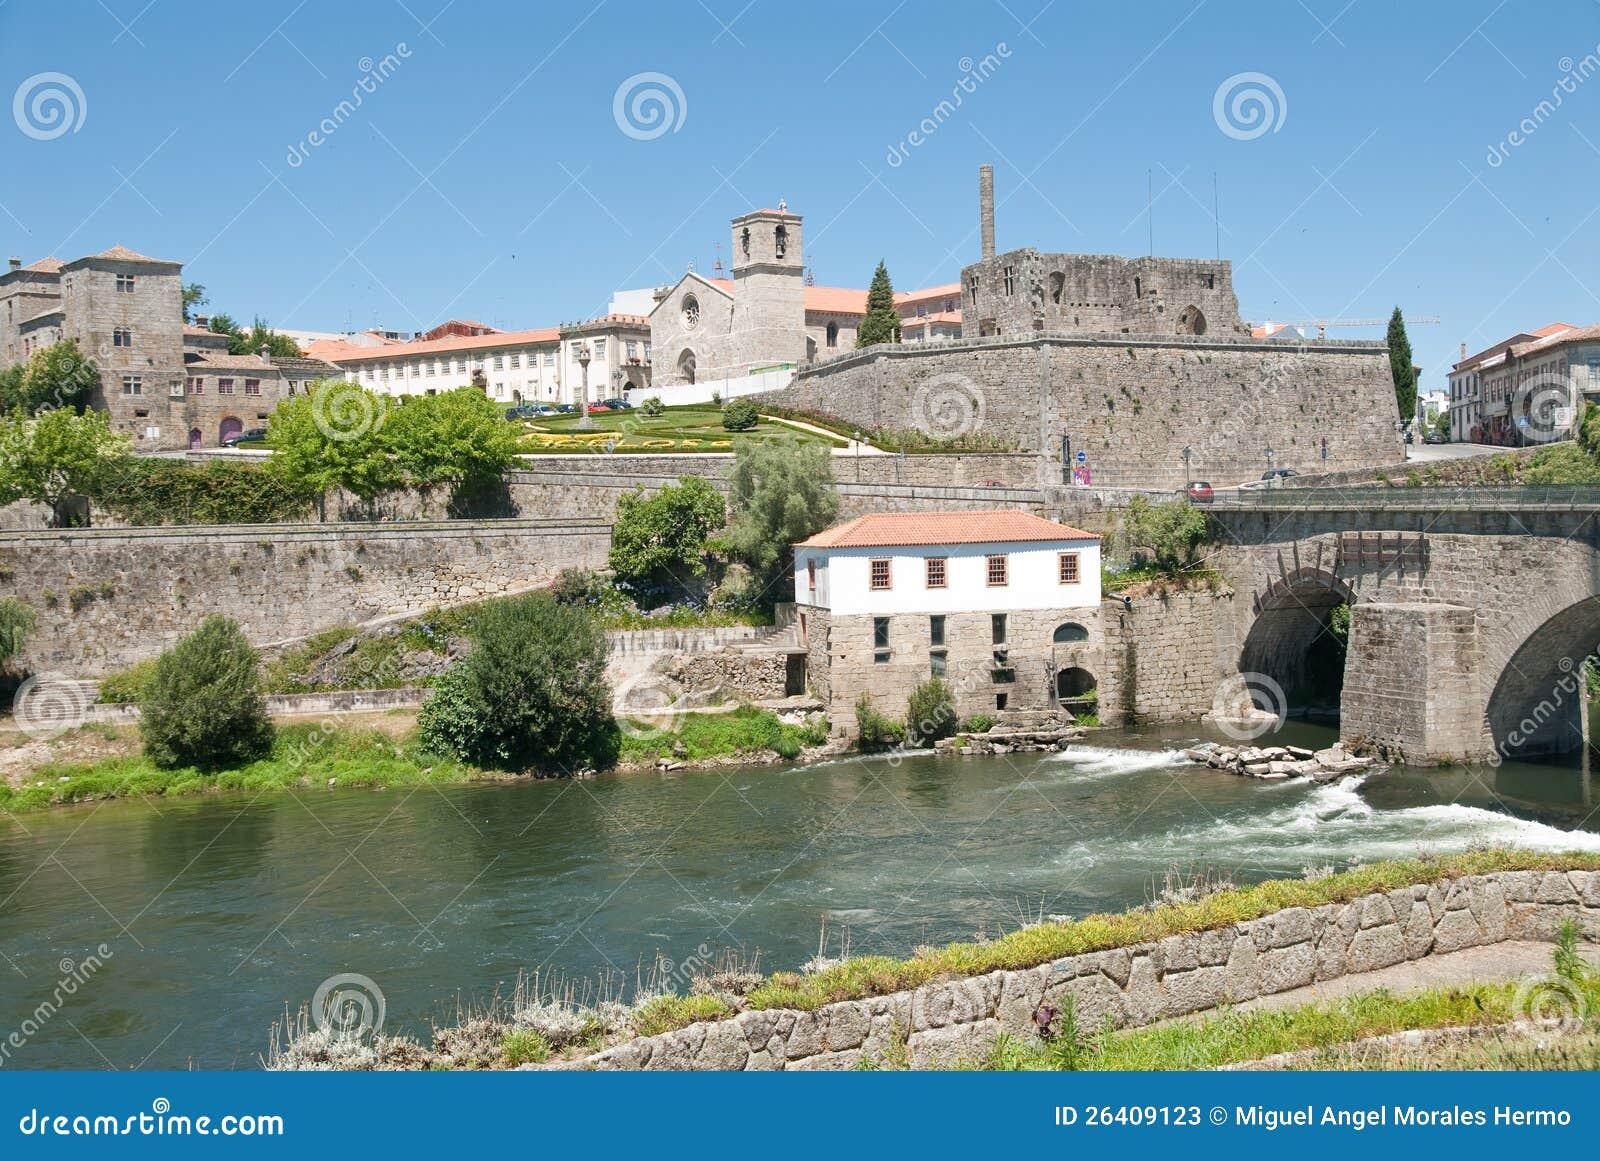 Barcelos portugal stock image image of medieval river for Acheter carrelage au portugal